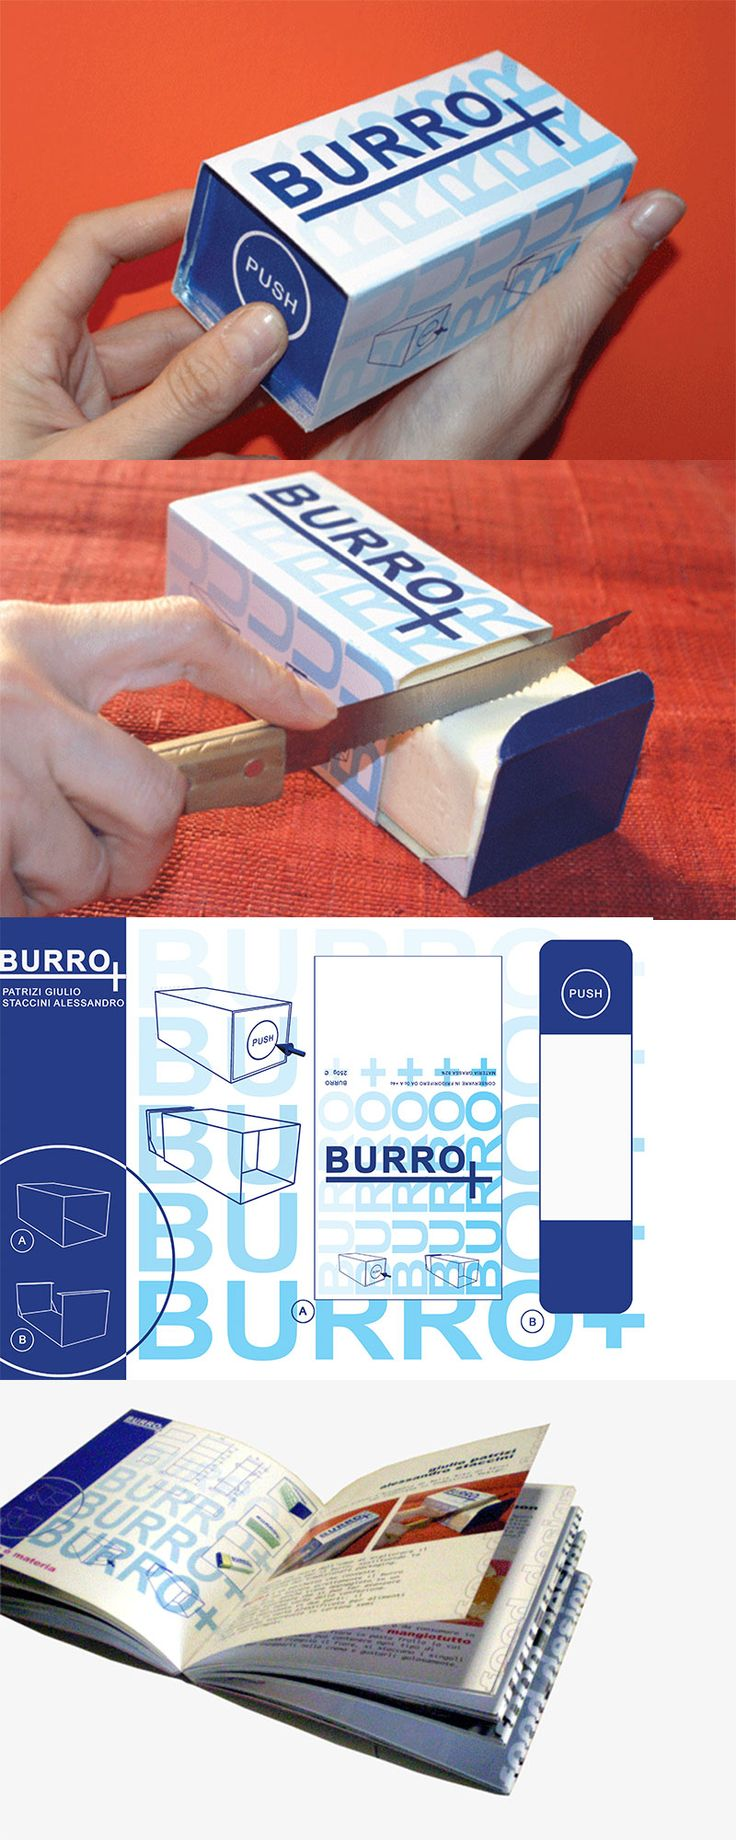 Burro+, Packaging Design ─ Giulio Patrizi Design Agency ©   #packaging #coffee #design